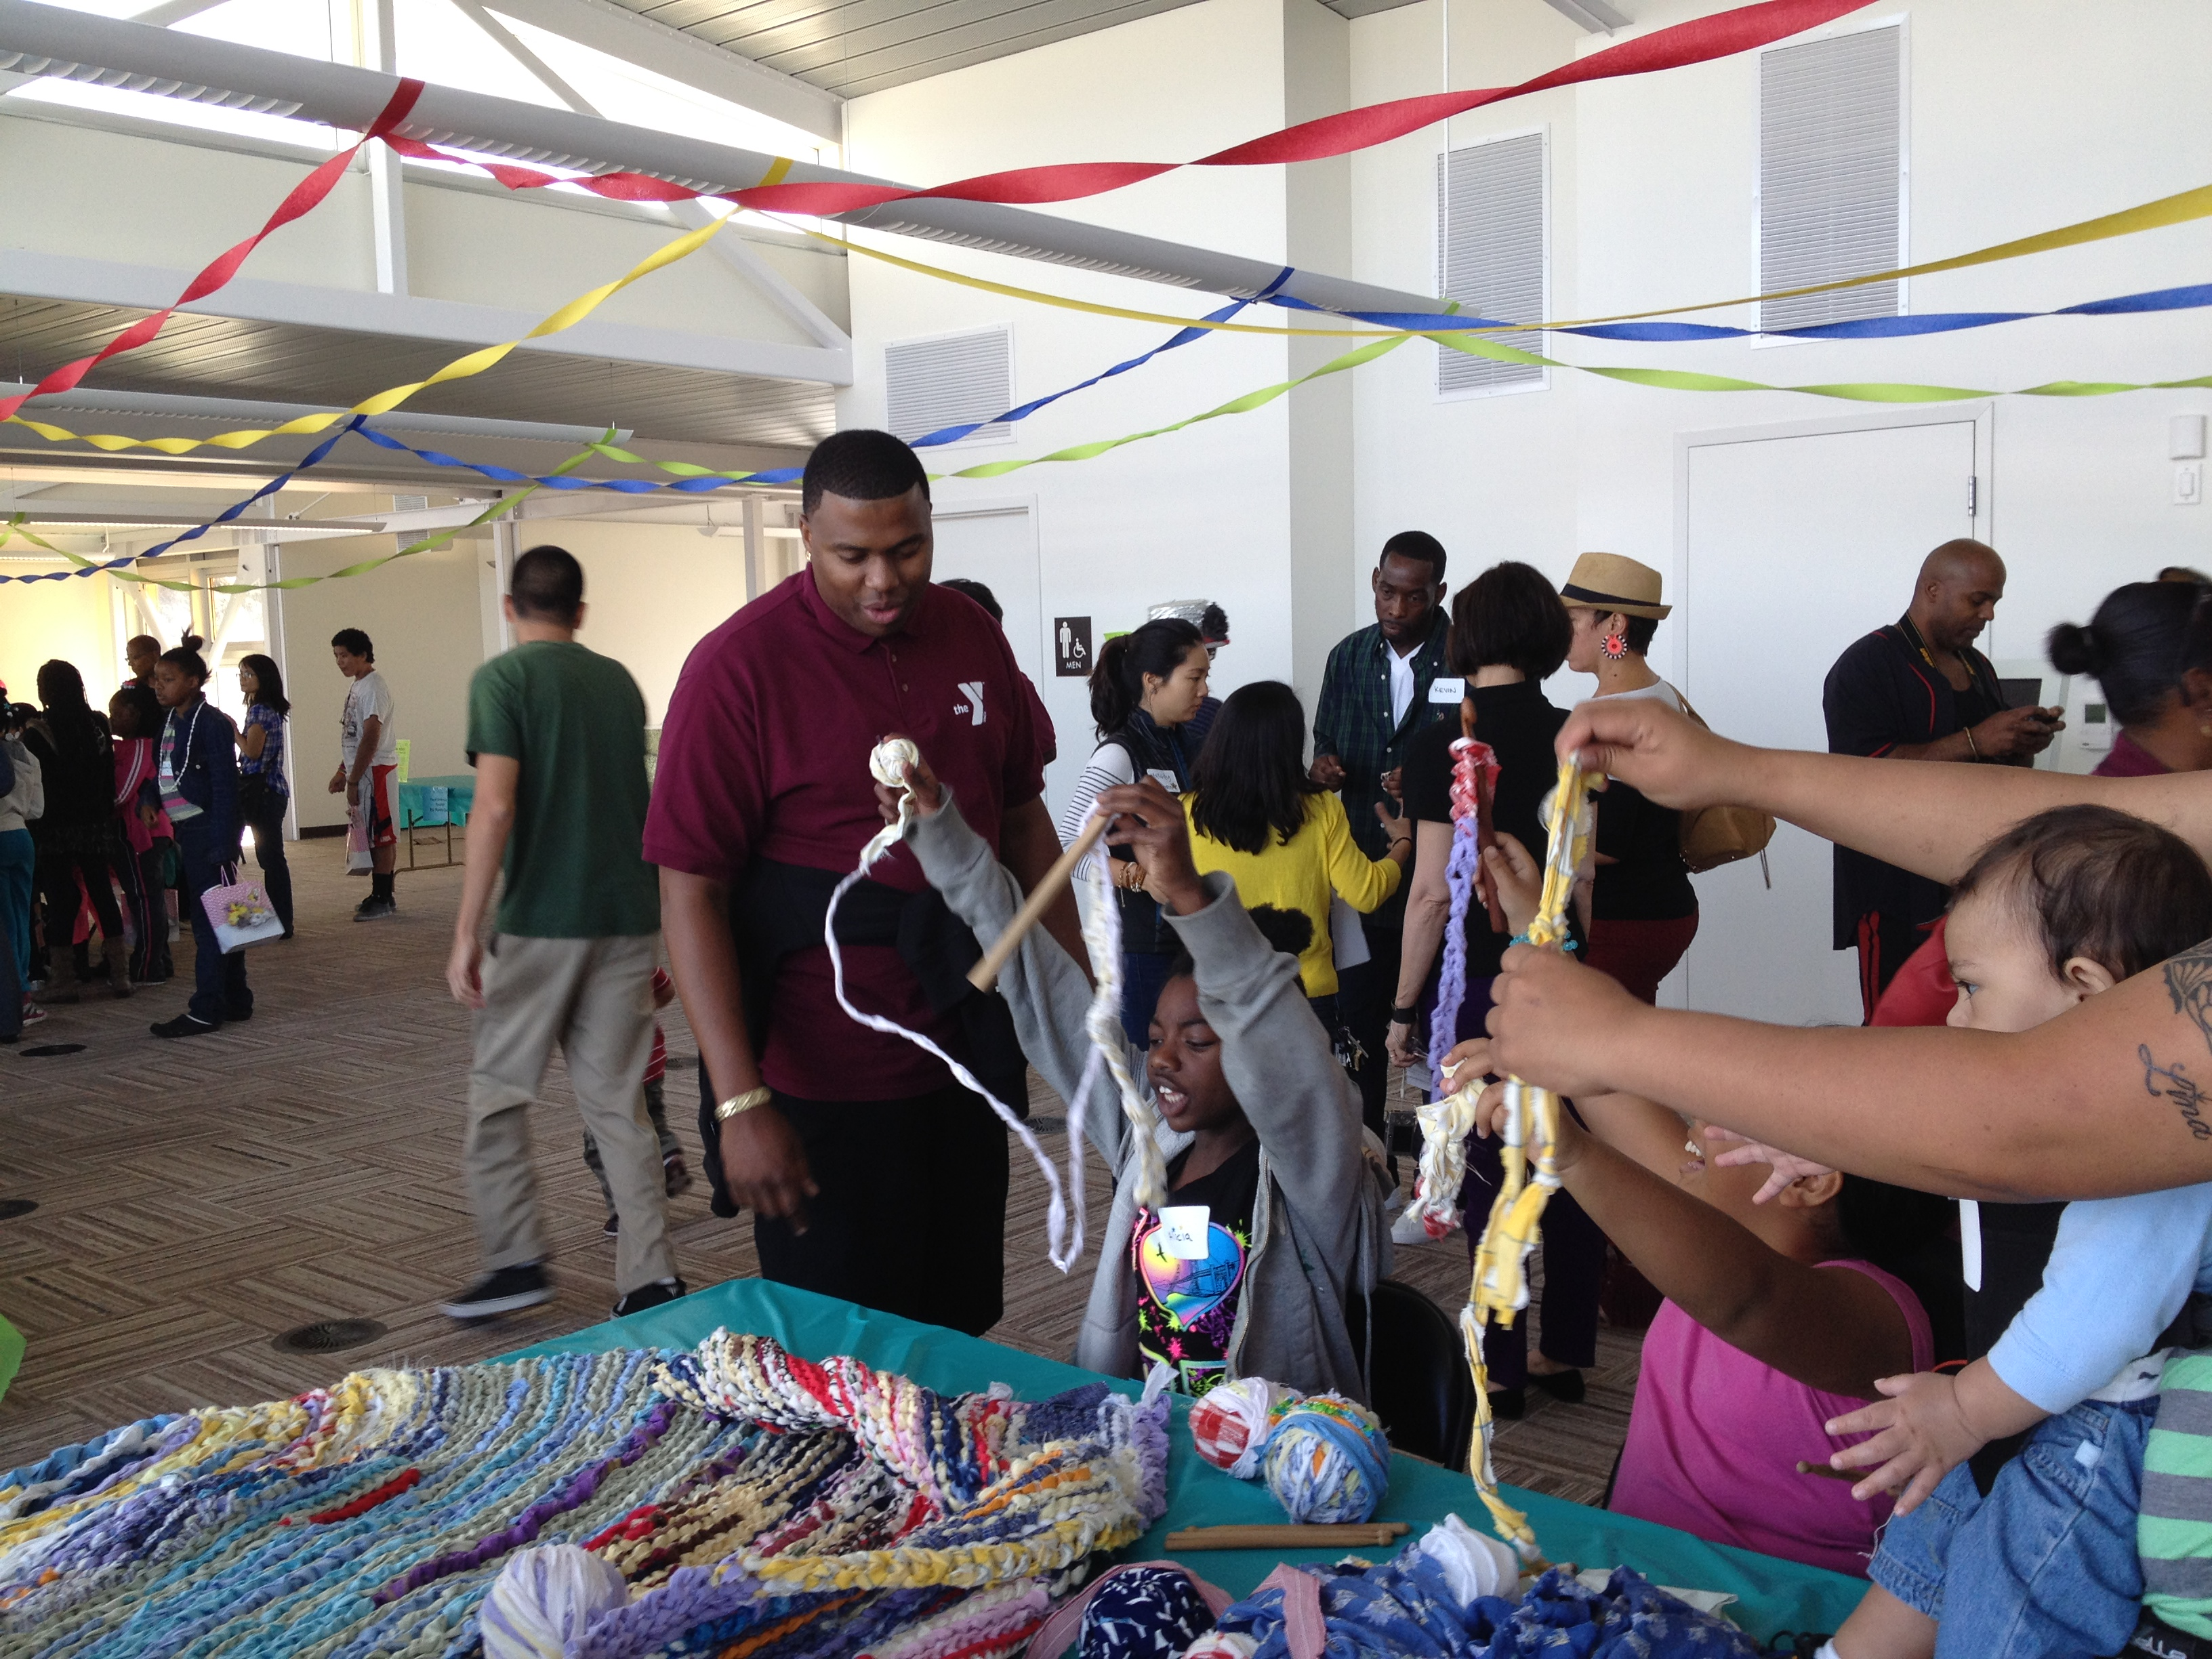 Ramekon O'Arwisters, Crochet Jam, Hunter's Points Community Center, San Francisco, 2014